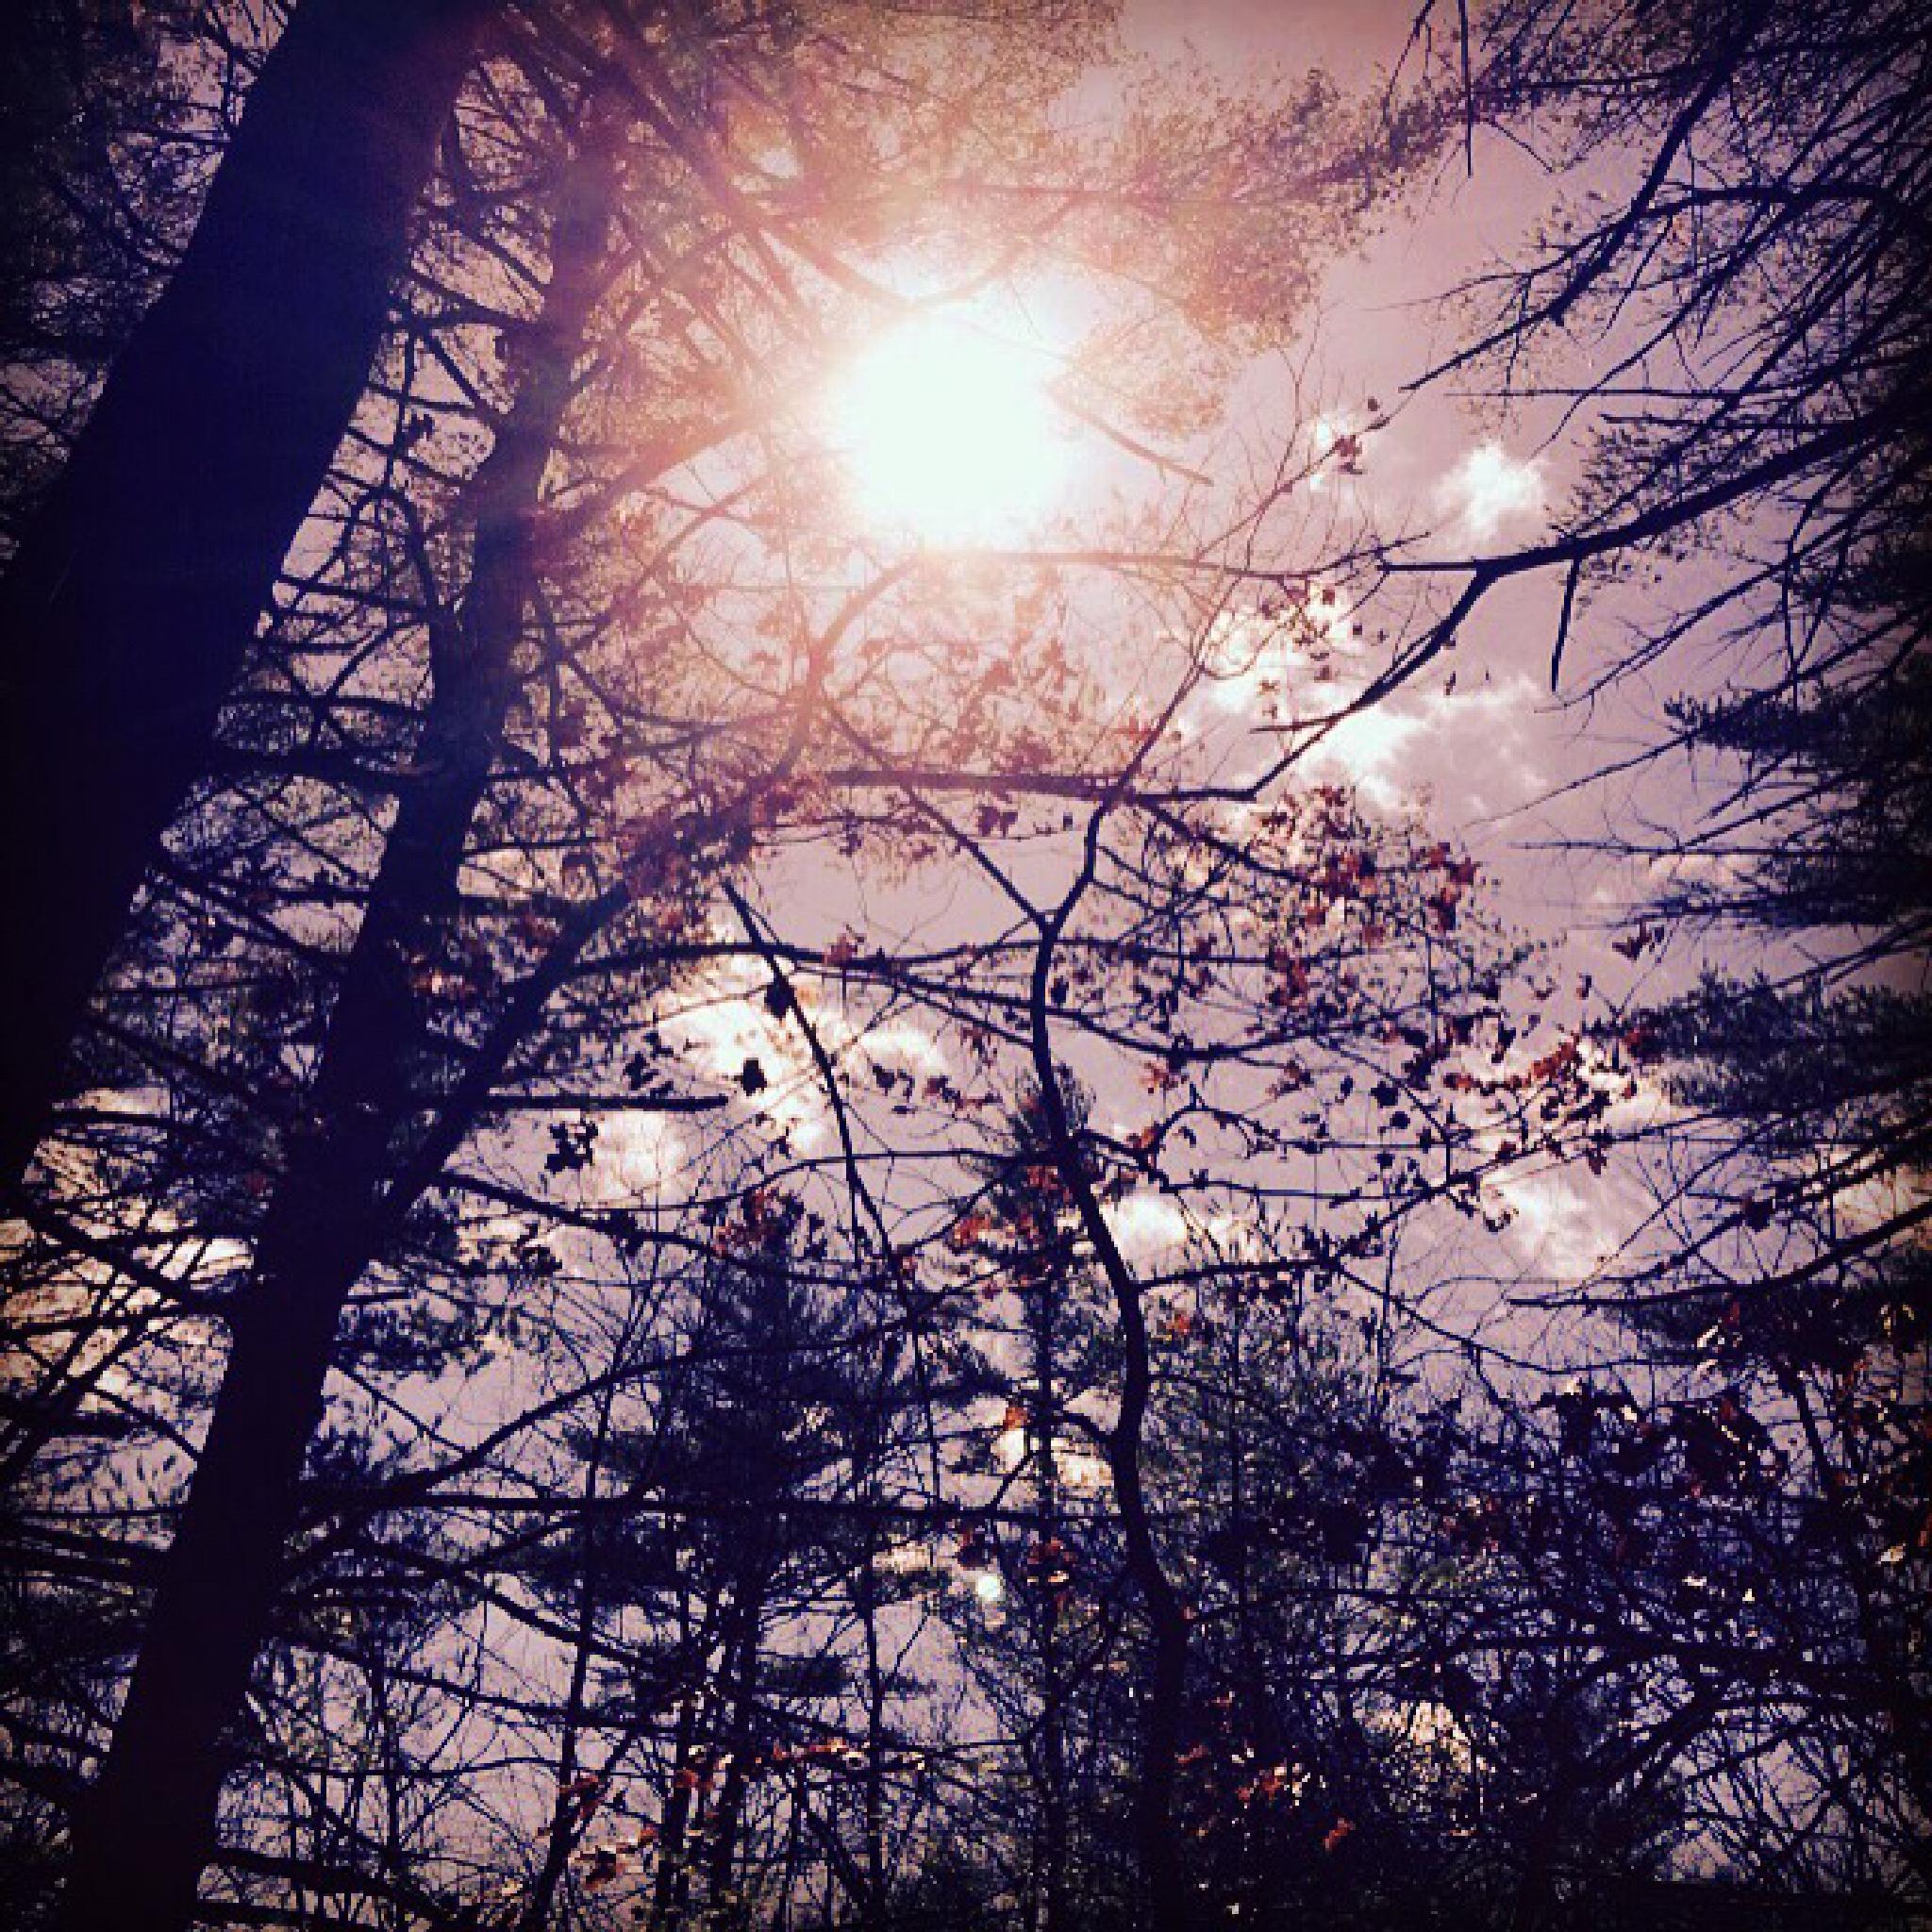 IMG_1194 by Rhonda